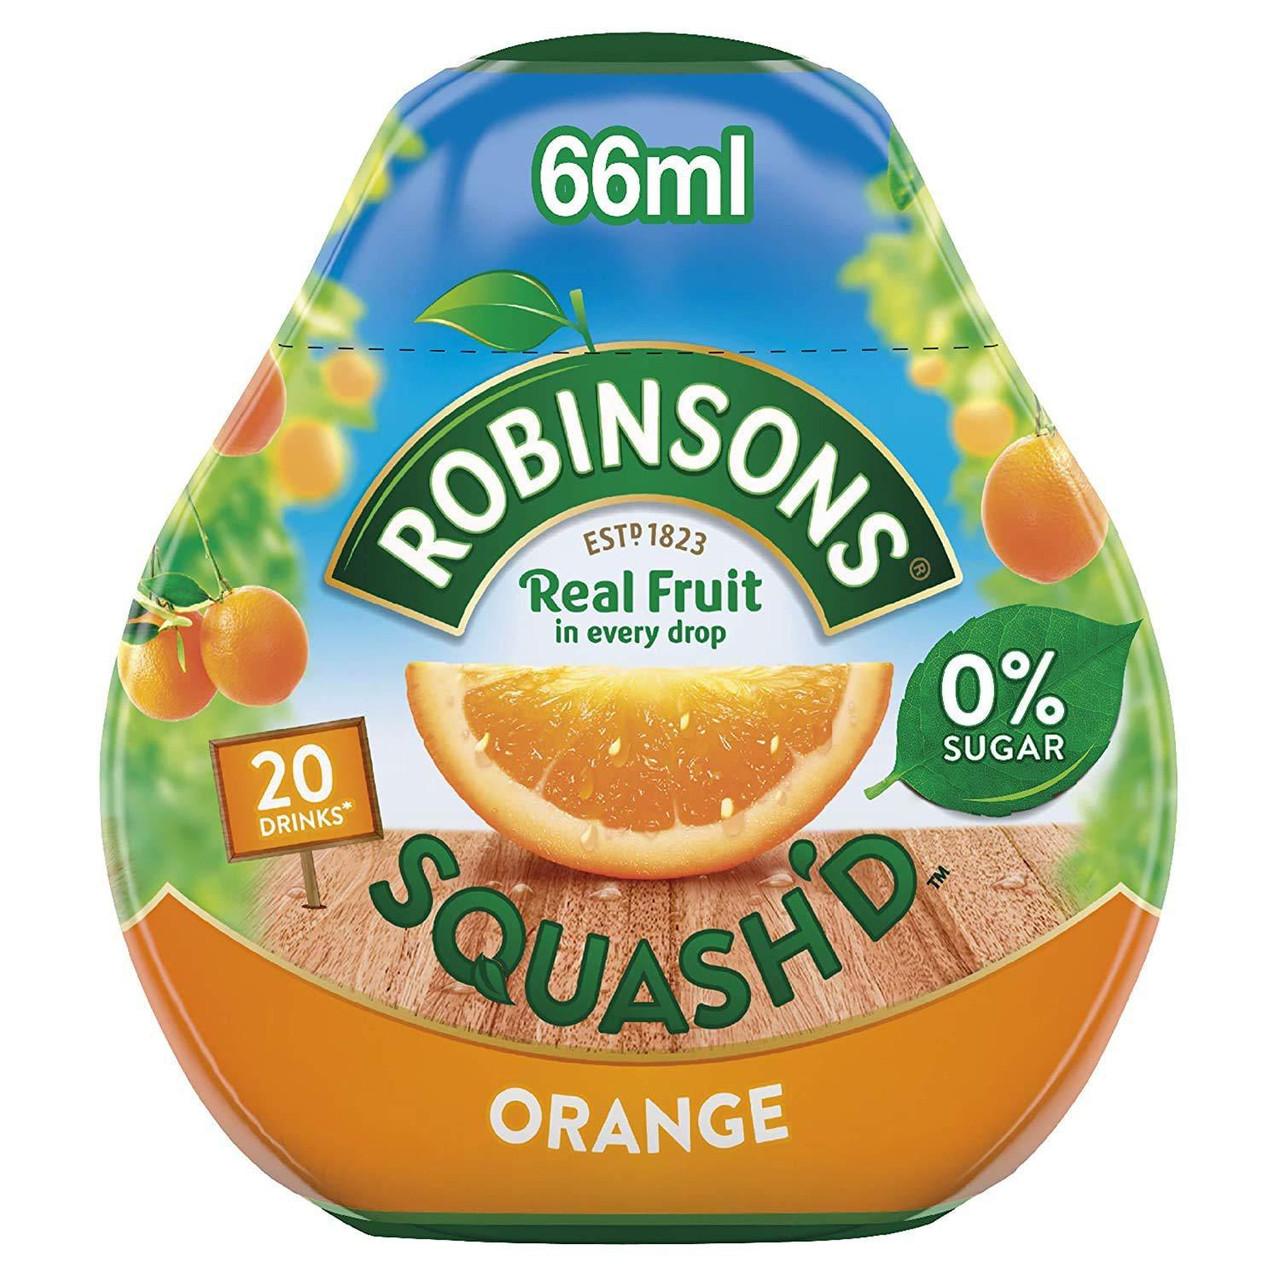 Robinsons Squash'd - Orange, 66ml